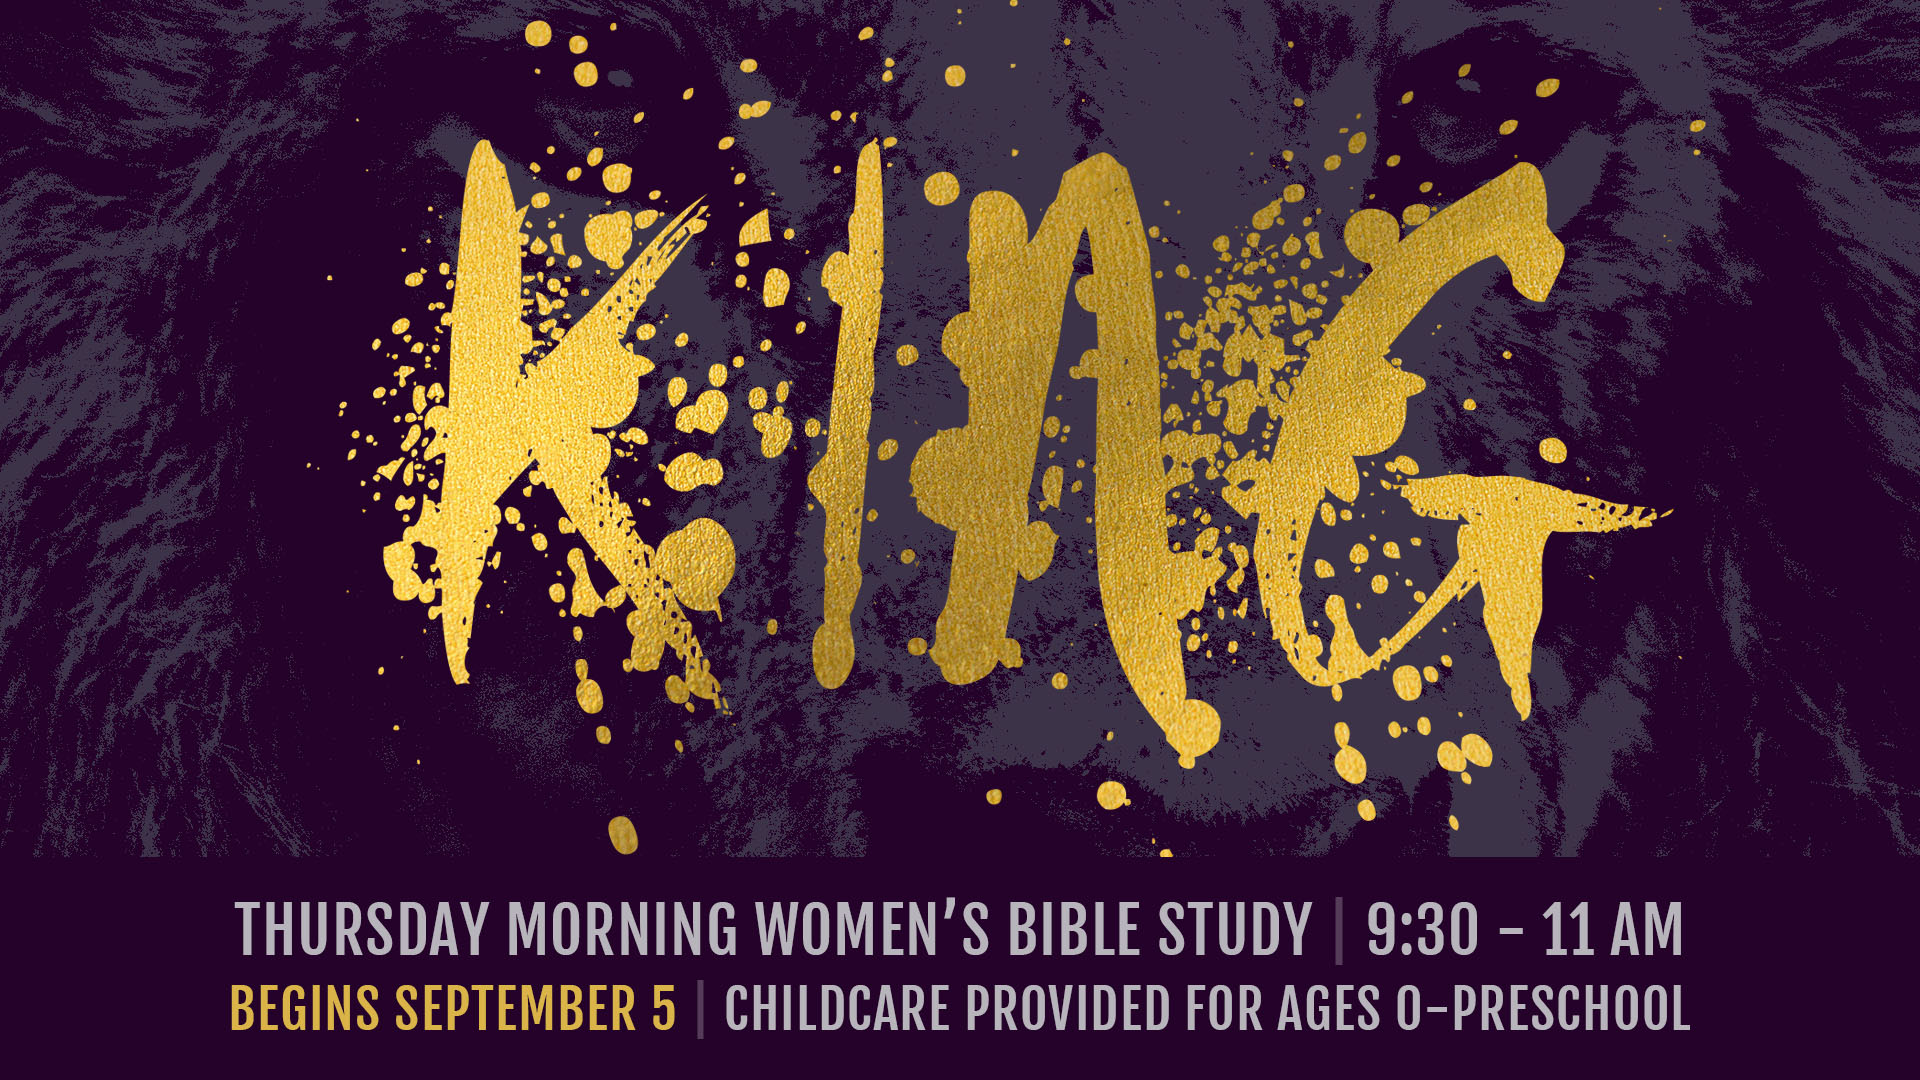 King Bible Study Announcement Slide.jpg